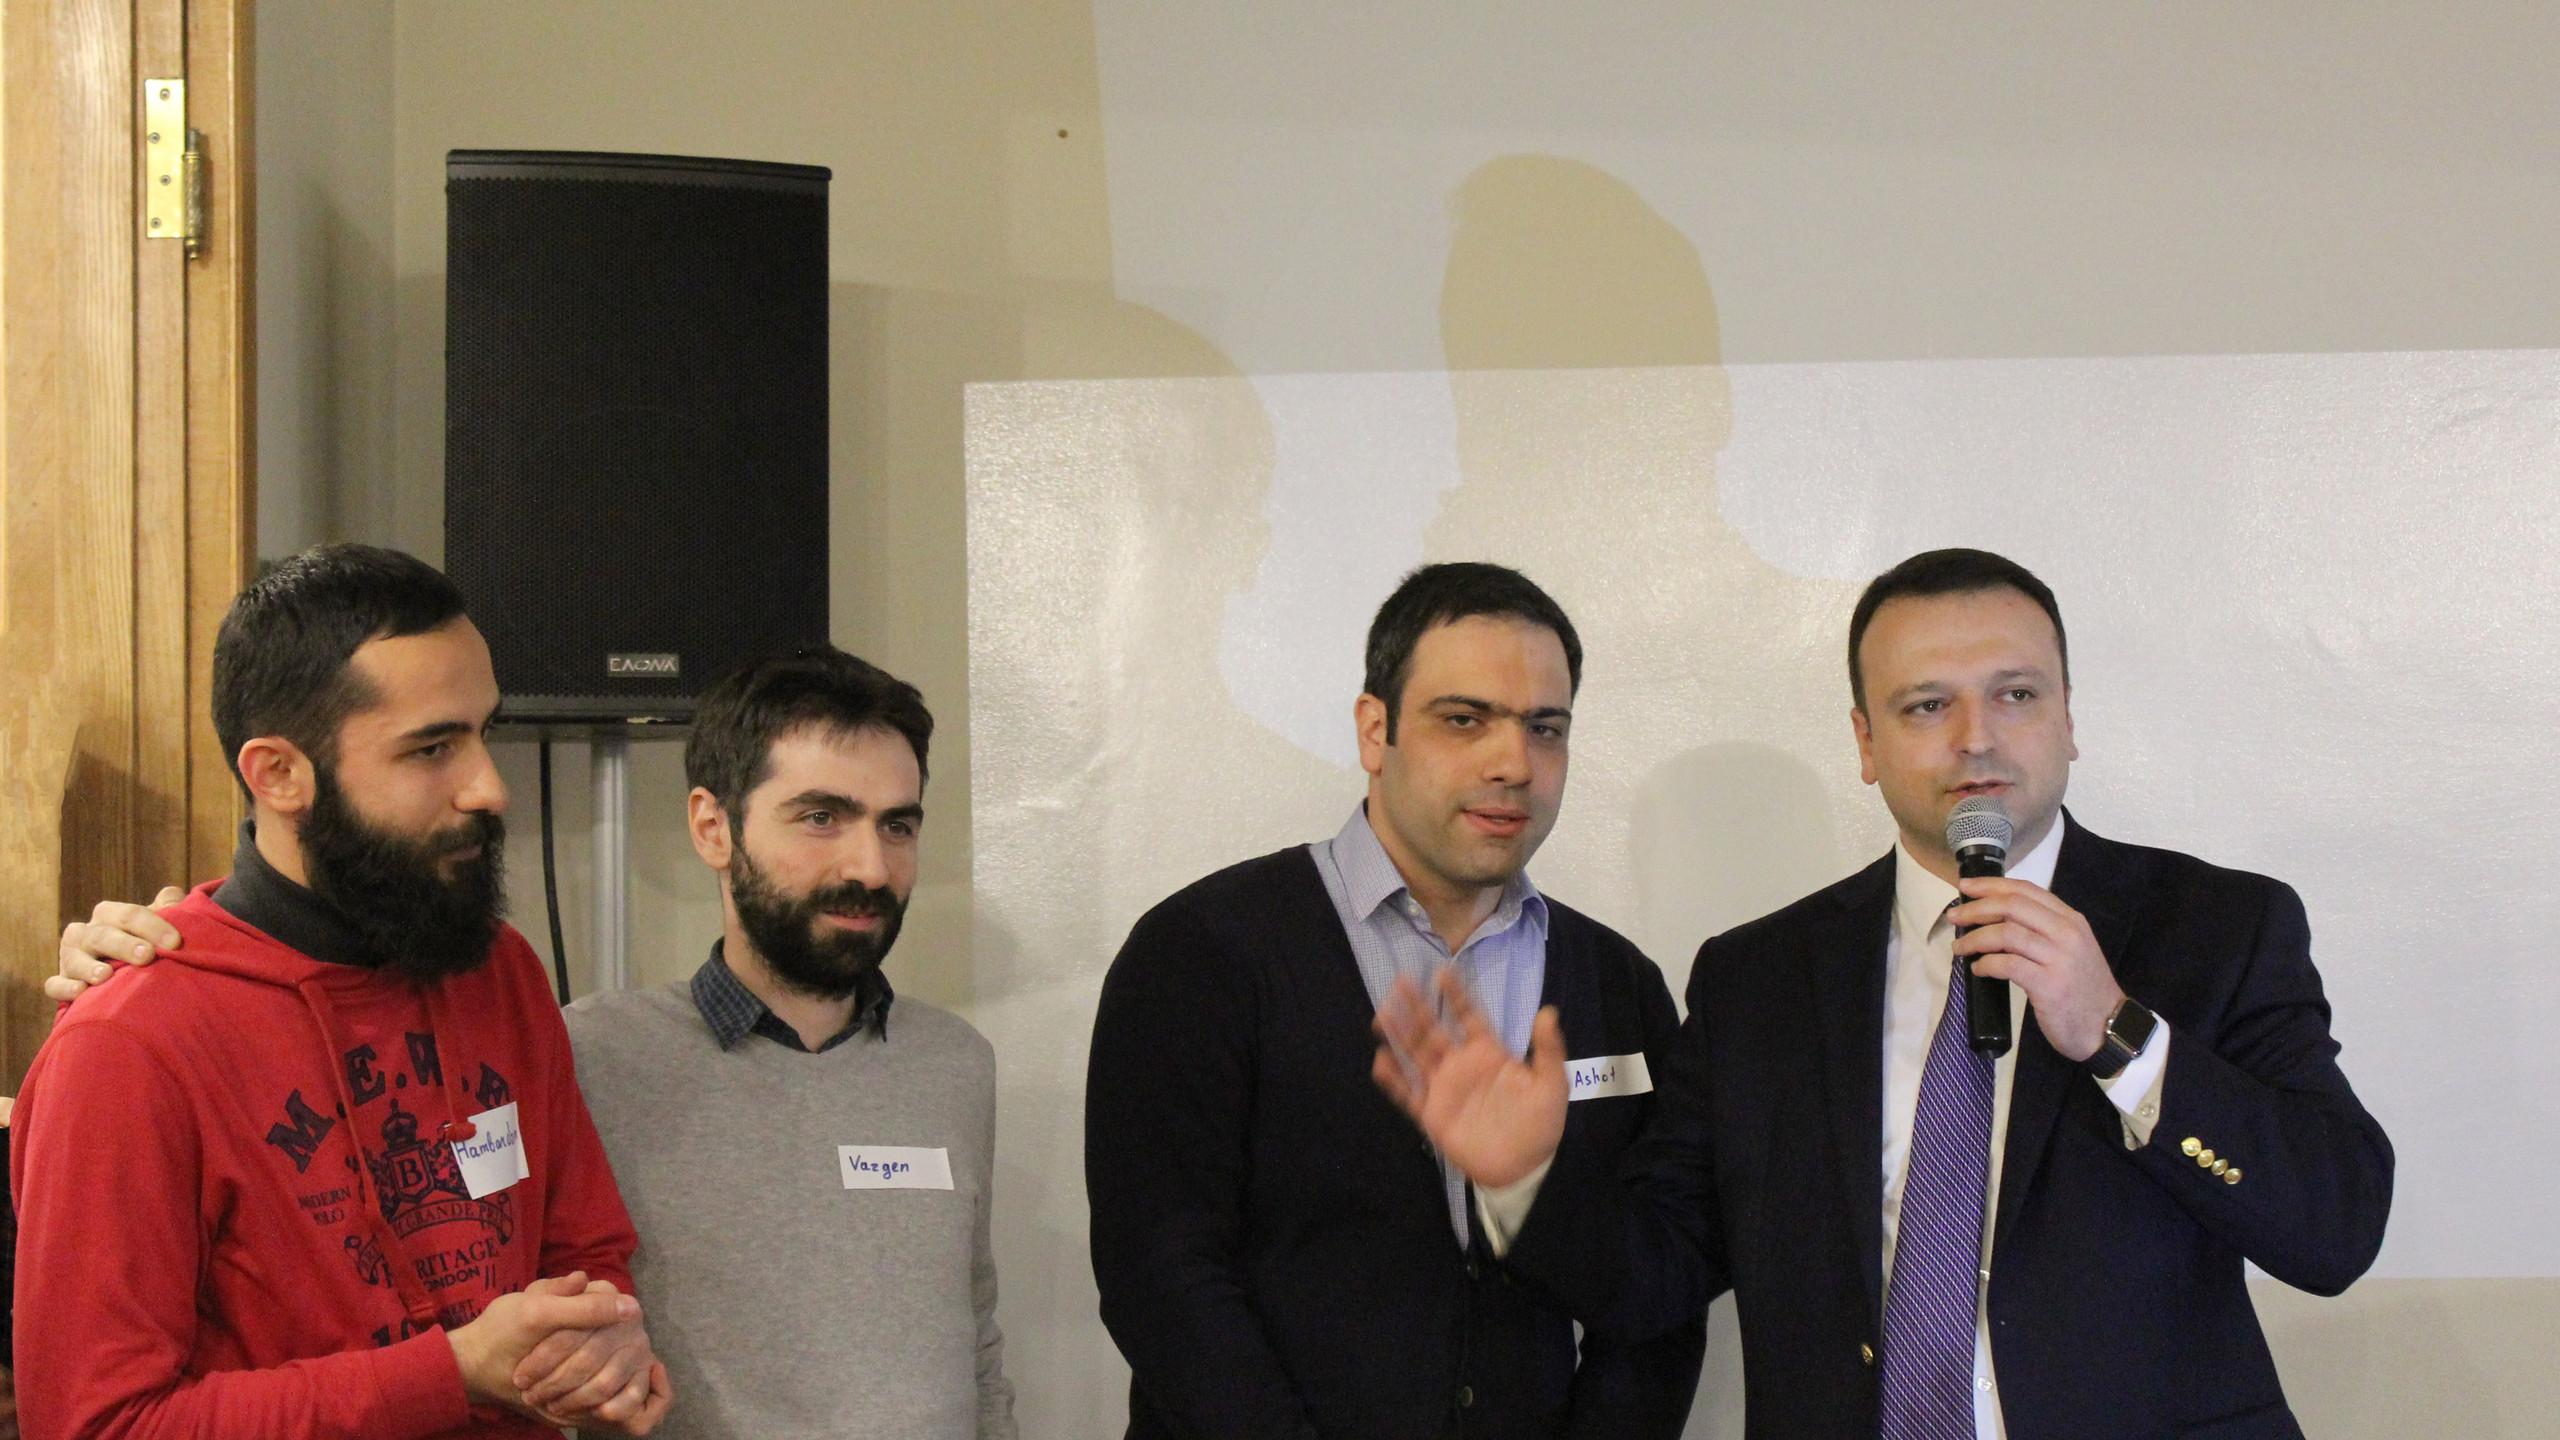 Emil Tarasyan's welcome address